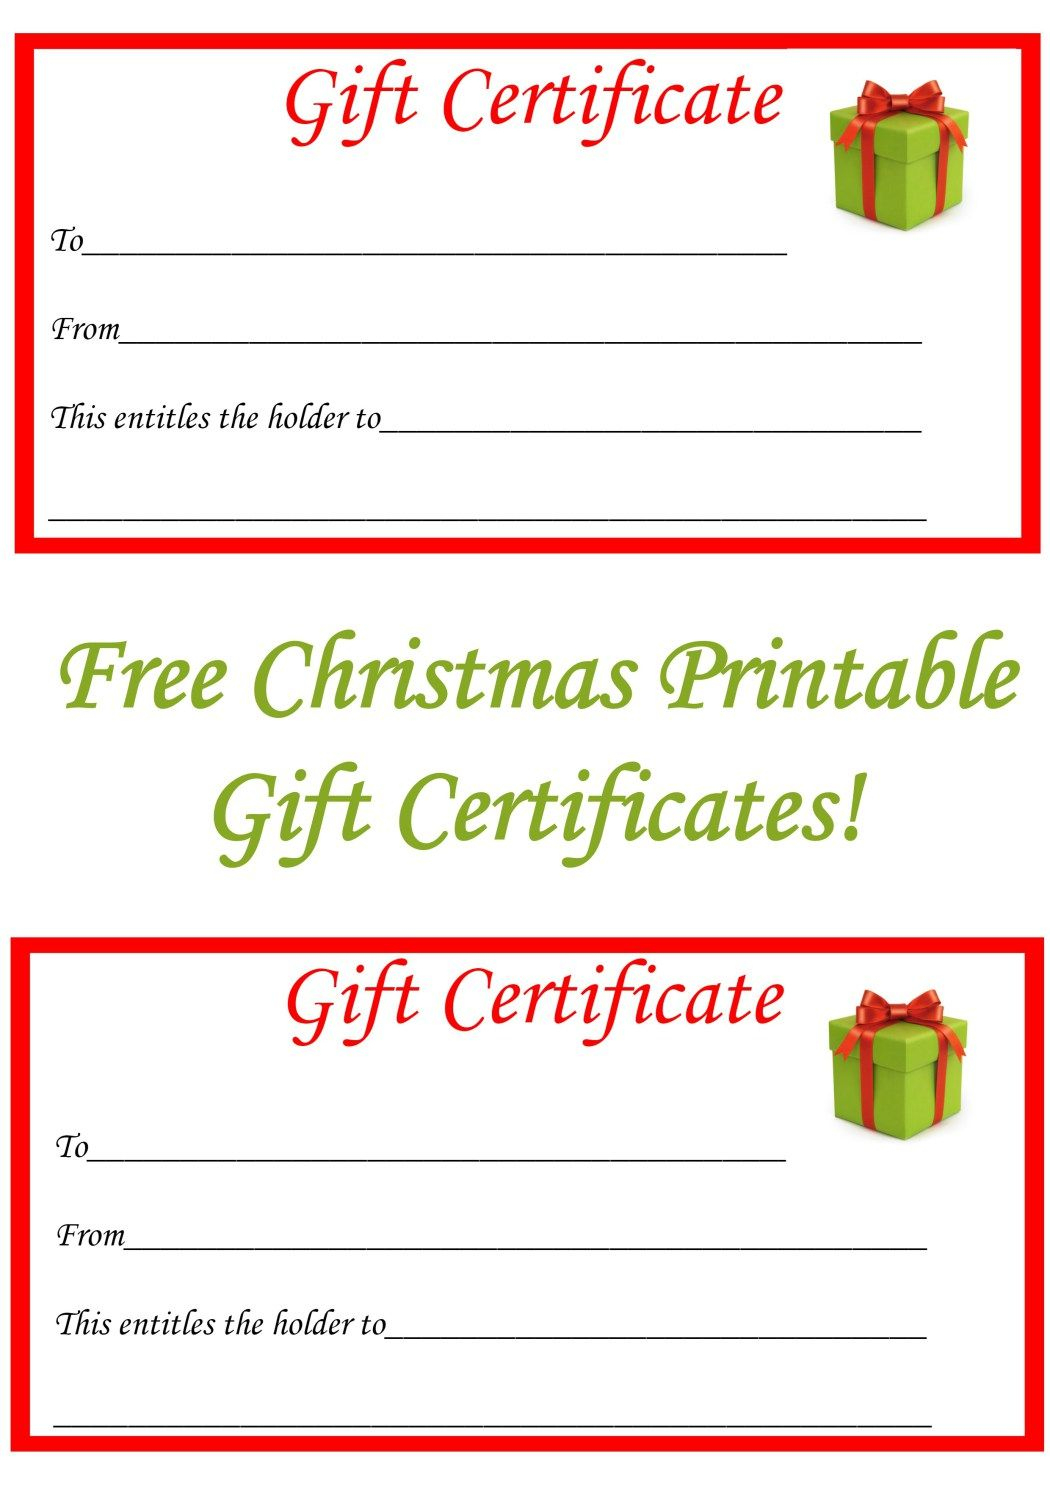 Free Christmas Printable Gift Certificates   Gift Ideas   Pinterest - Free Printable Christmas Gift Voucher Templates